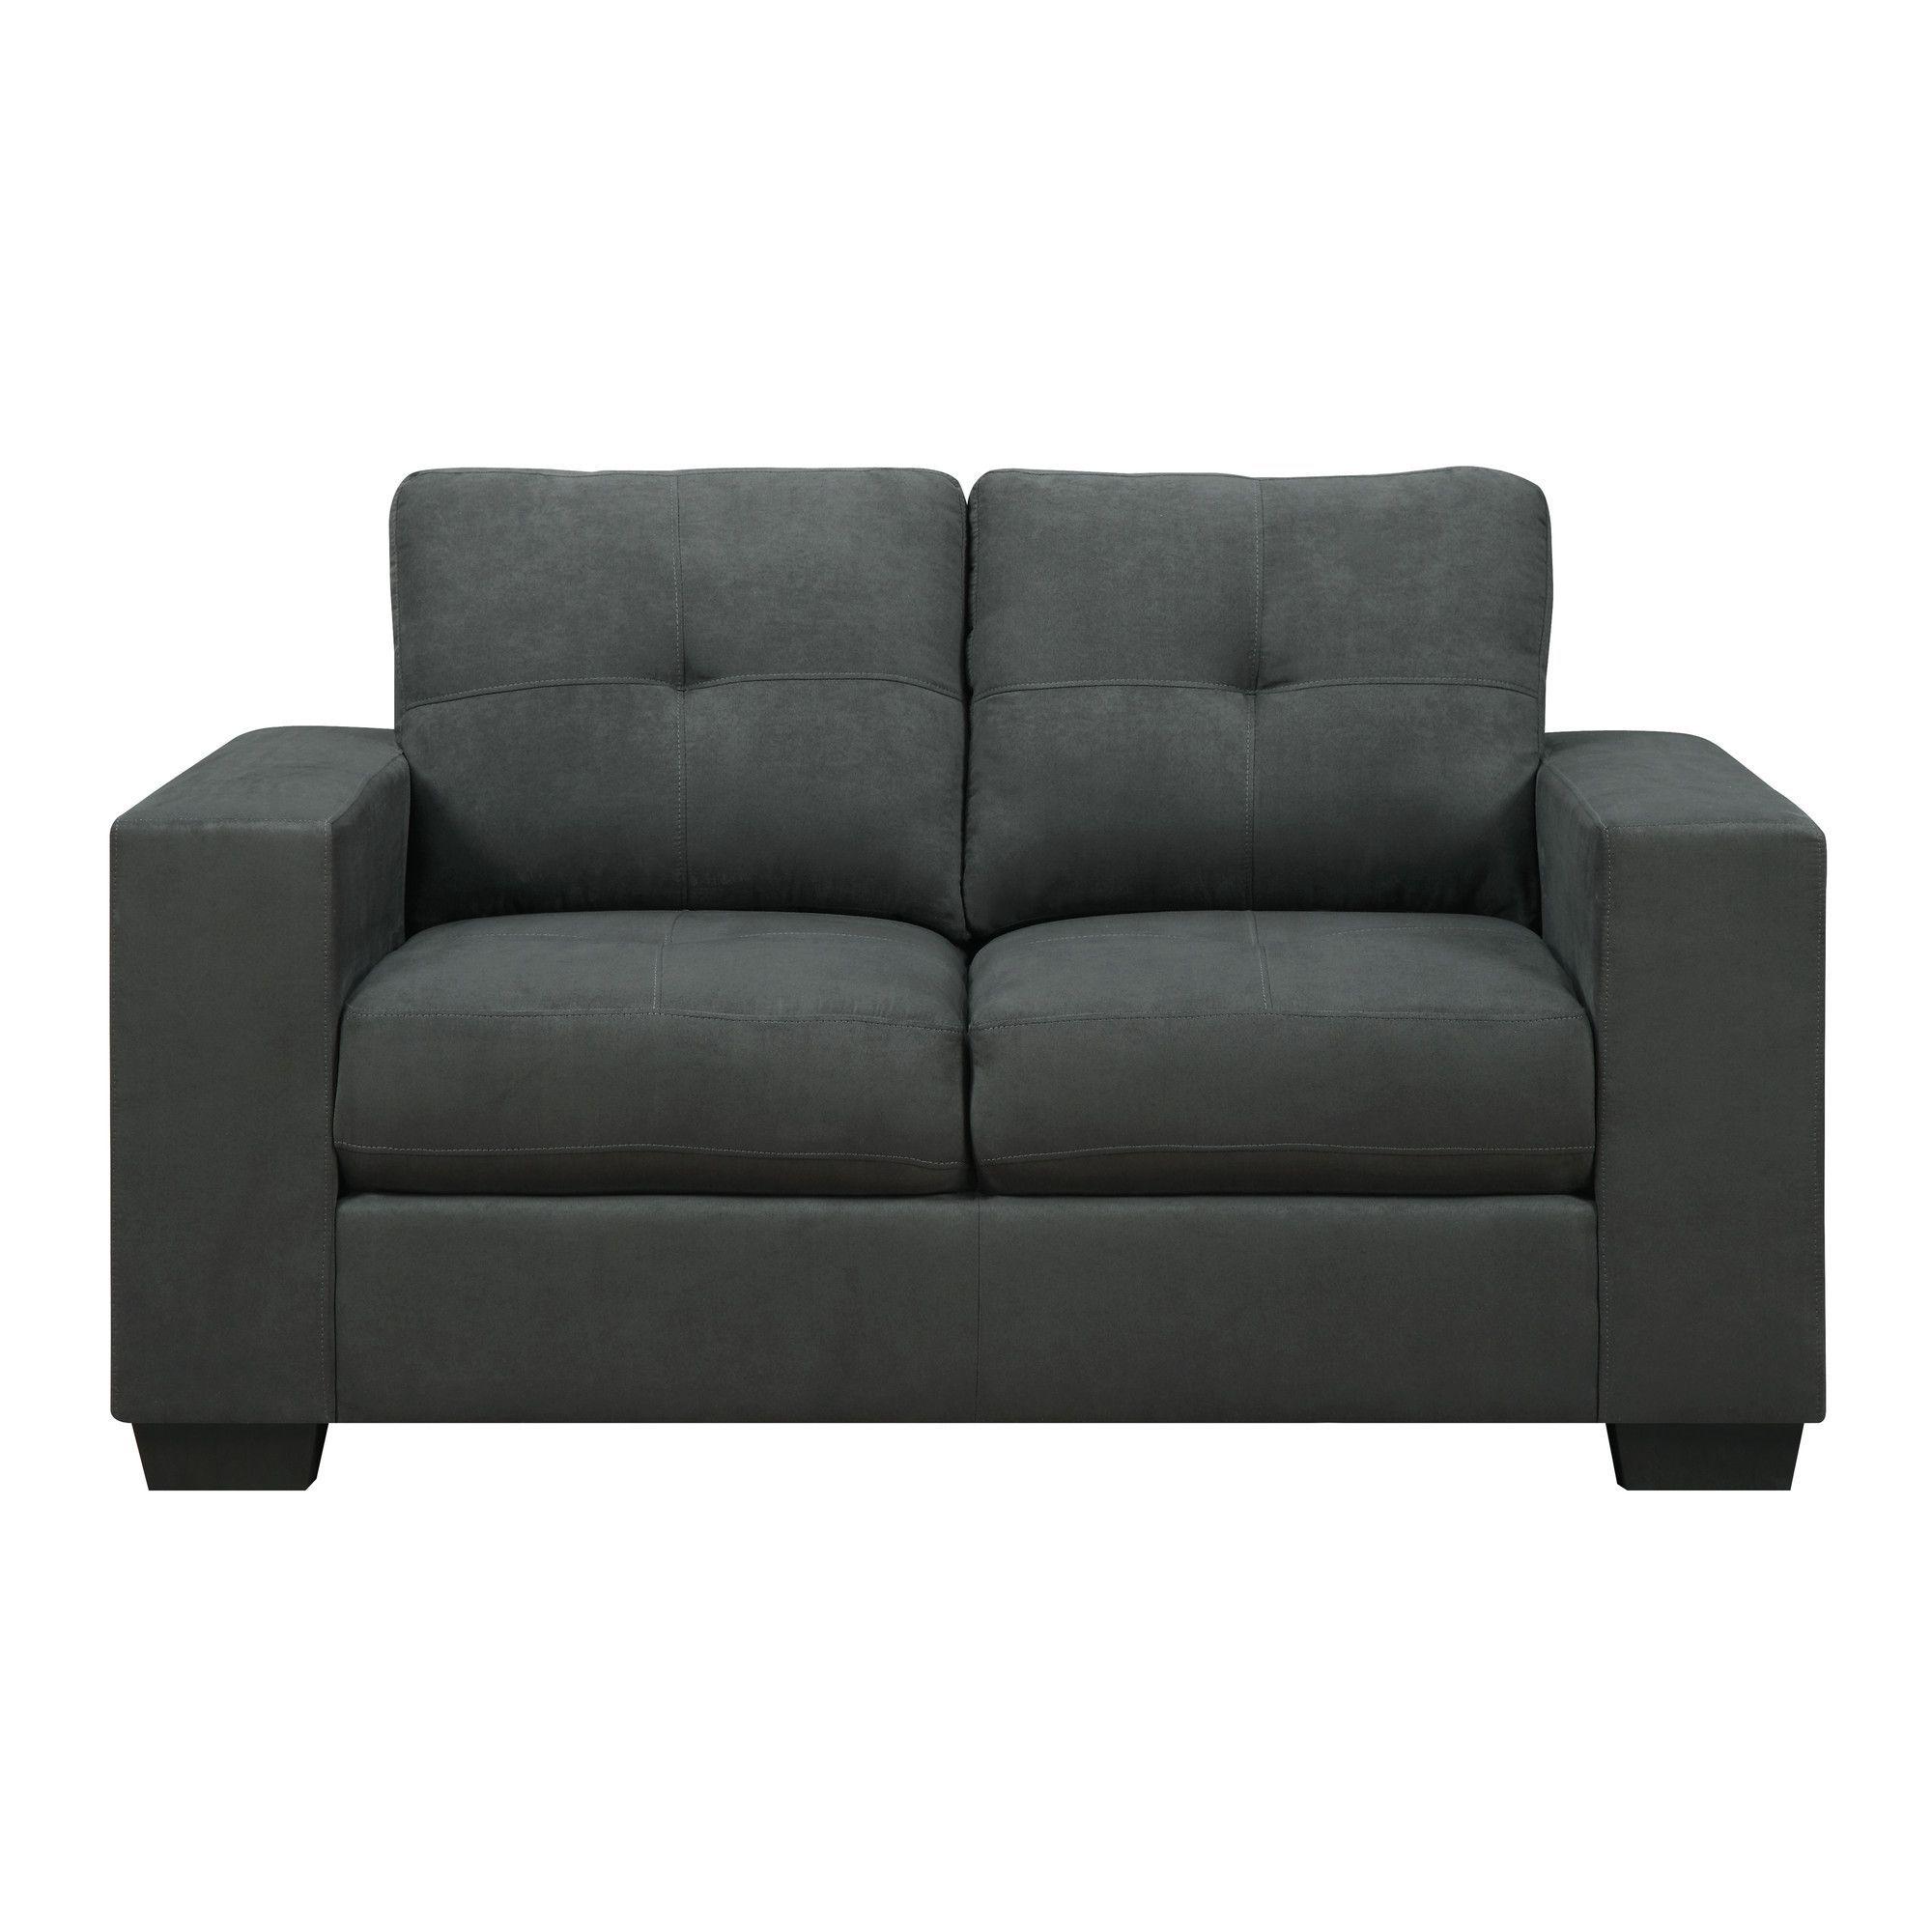 Koger Sofa Furniture, Love seat, Office furniture